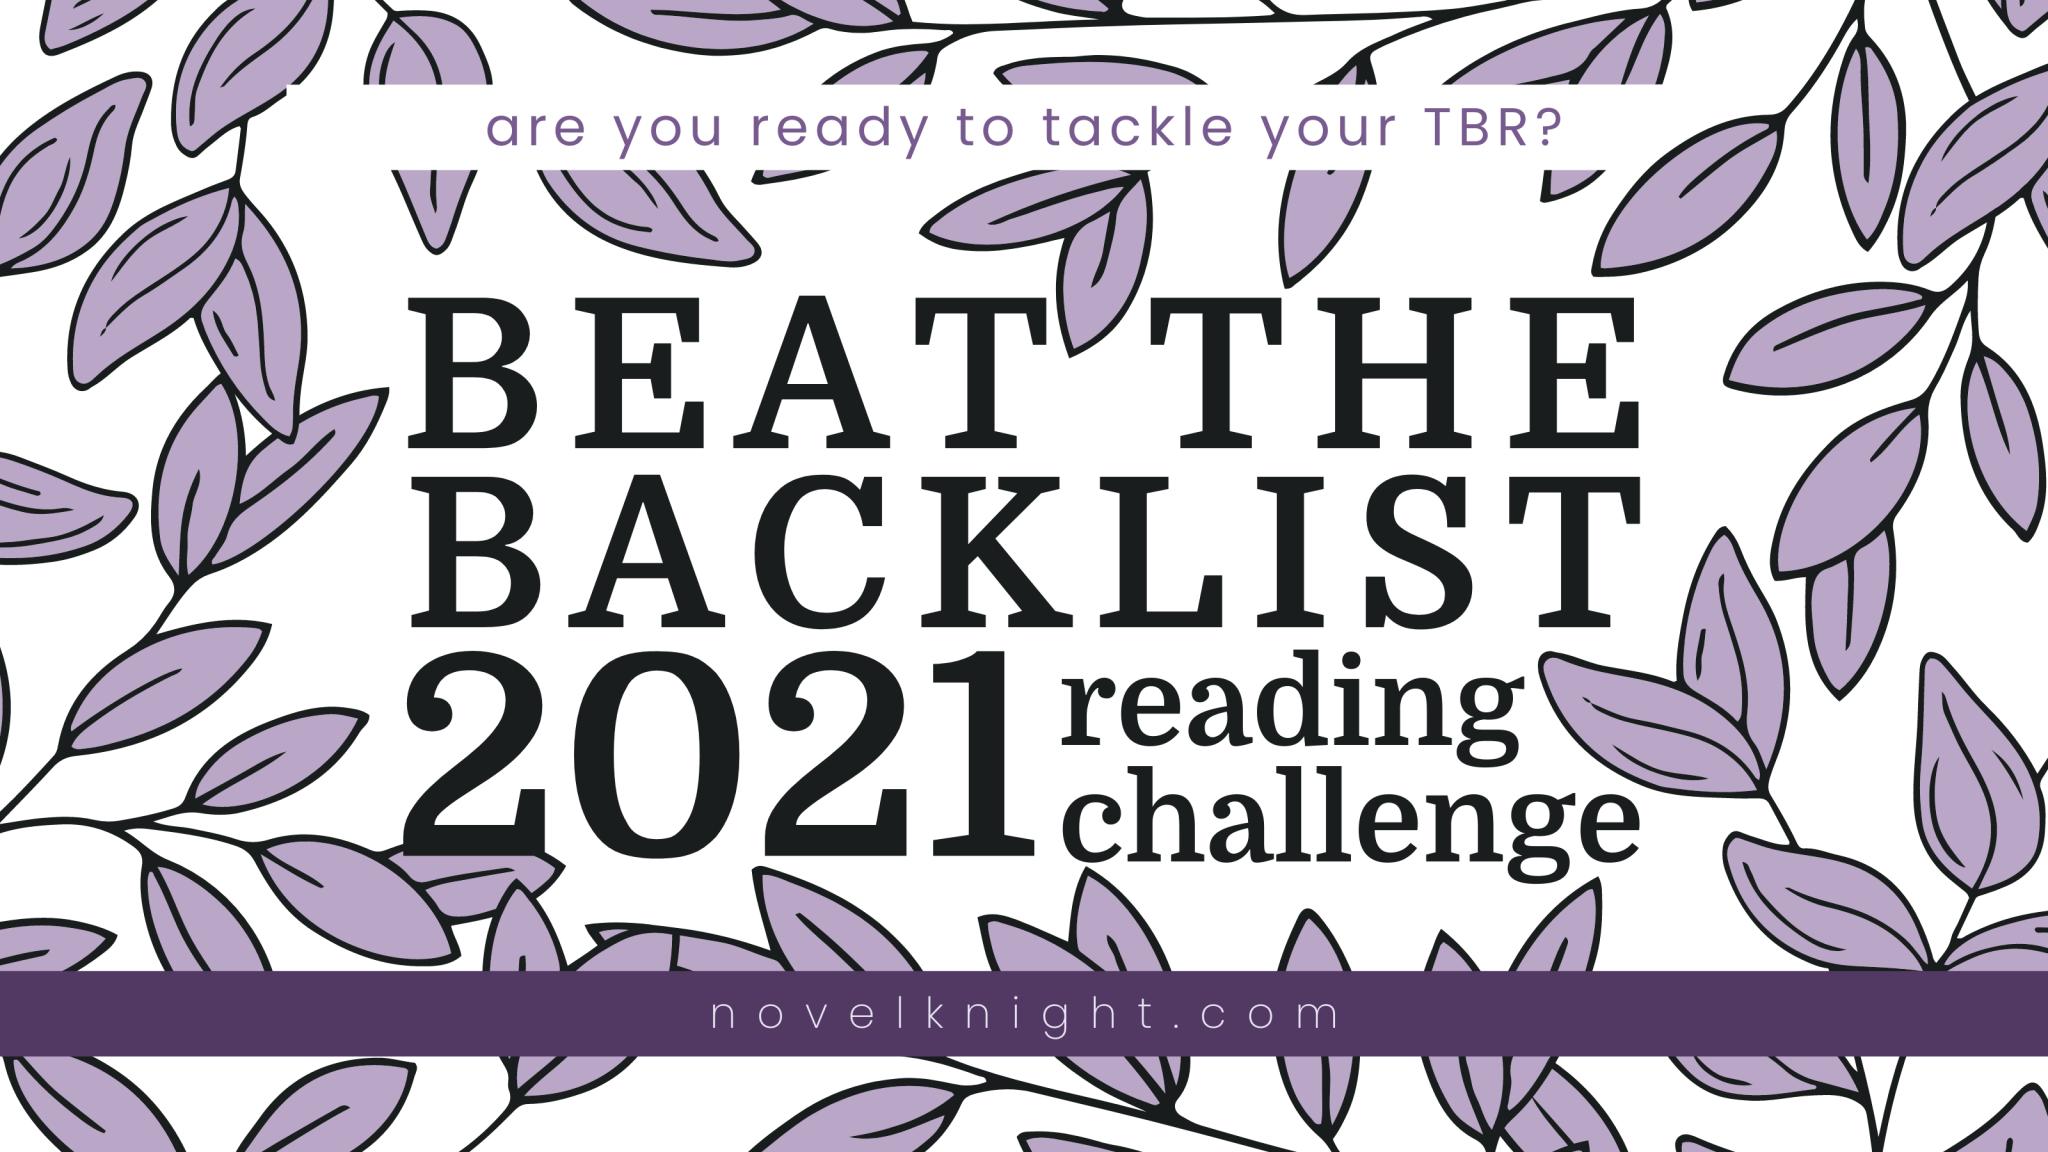 BTB-20201-twitter-banner